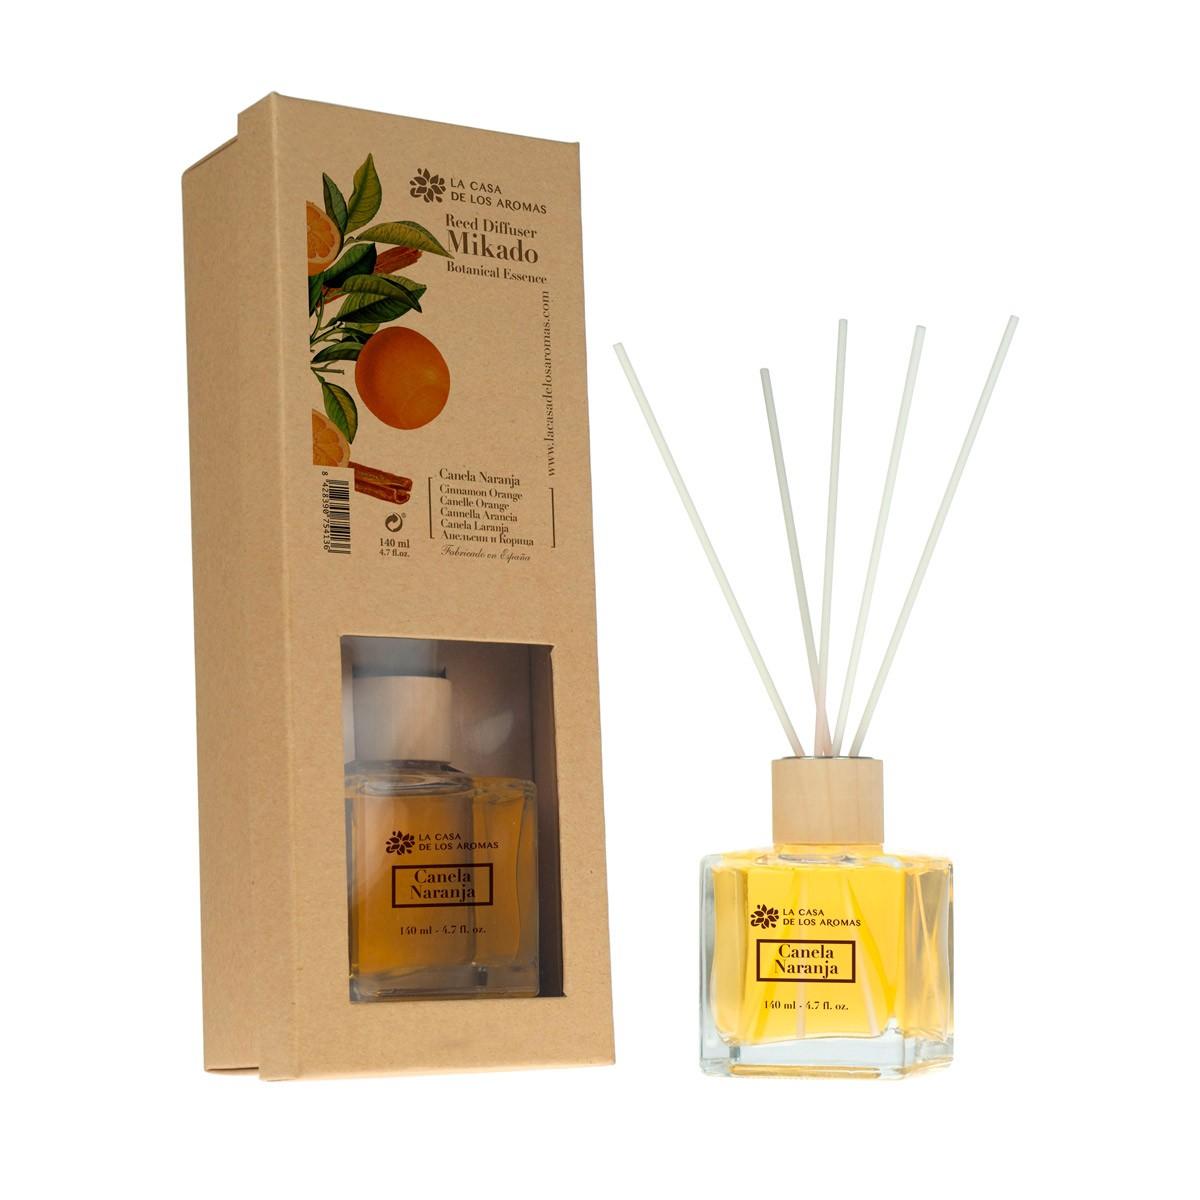 Cinnamon Orange Reed Diffuser 140ml